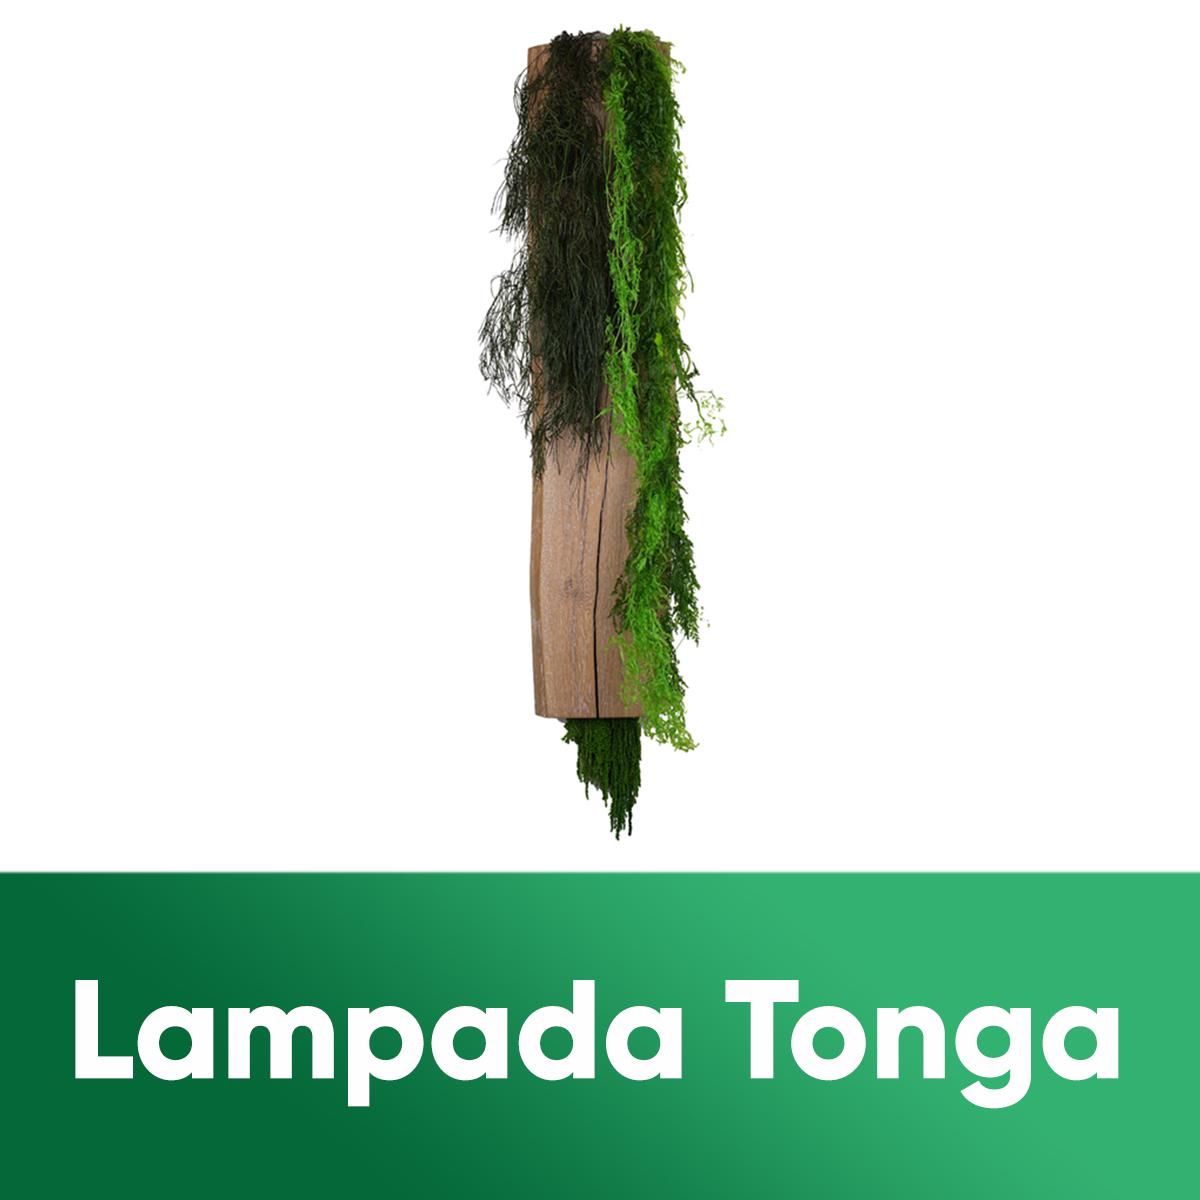 LAMPADA TONGA